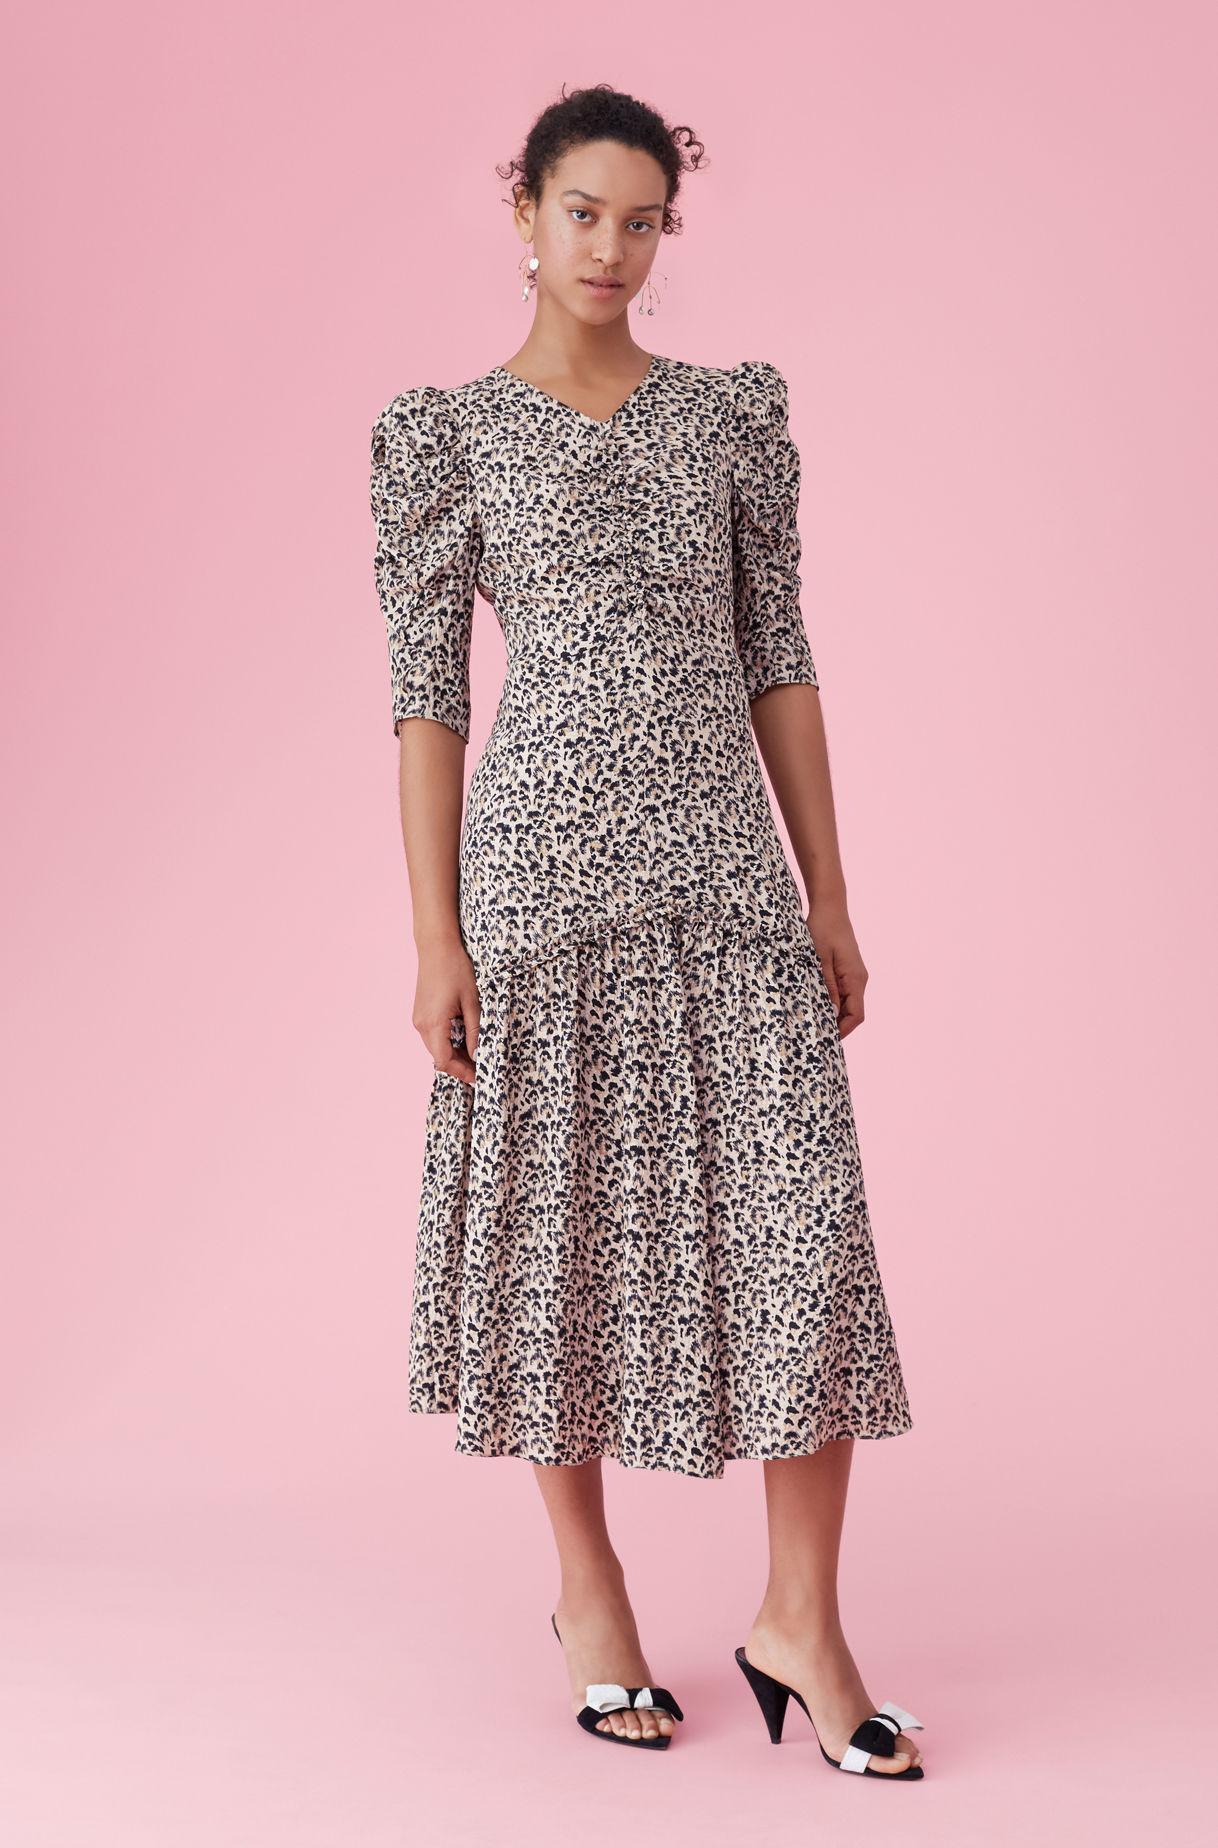 443c1a98571 Lyst - Rebecca Taylor Leopard Print Silk Ruched Dress Caramel